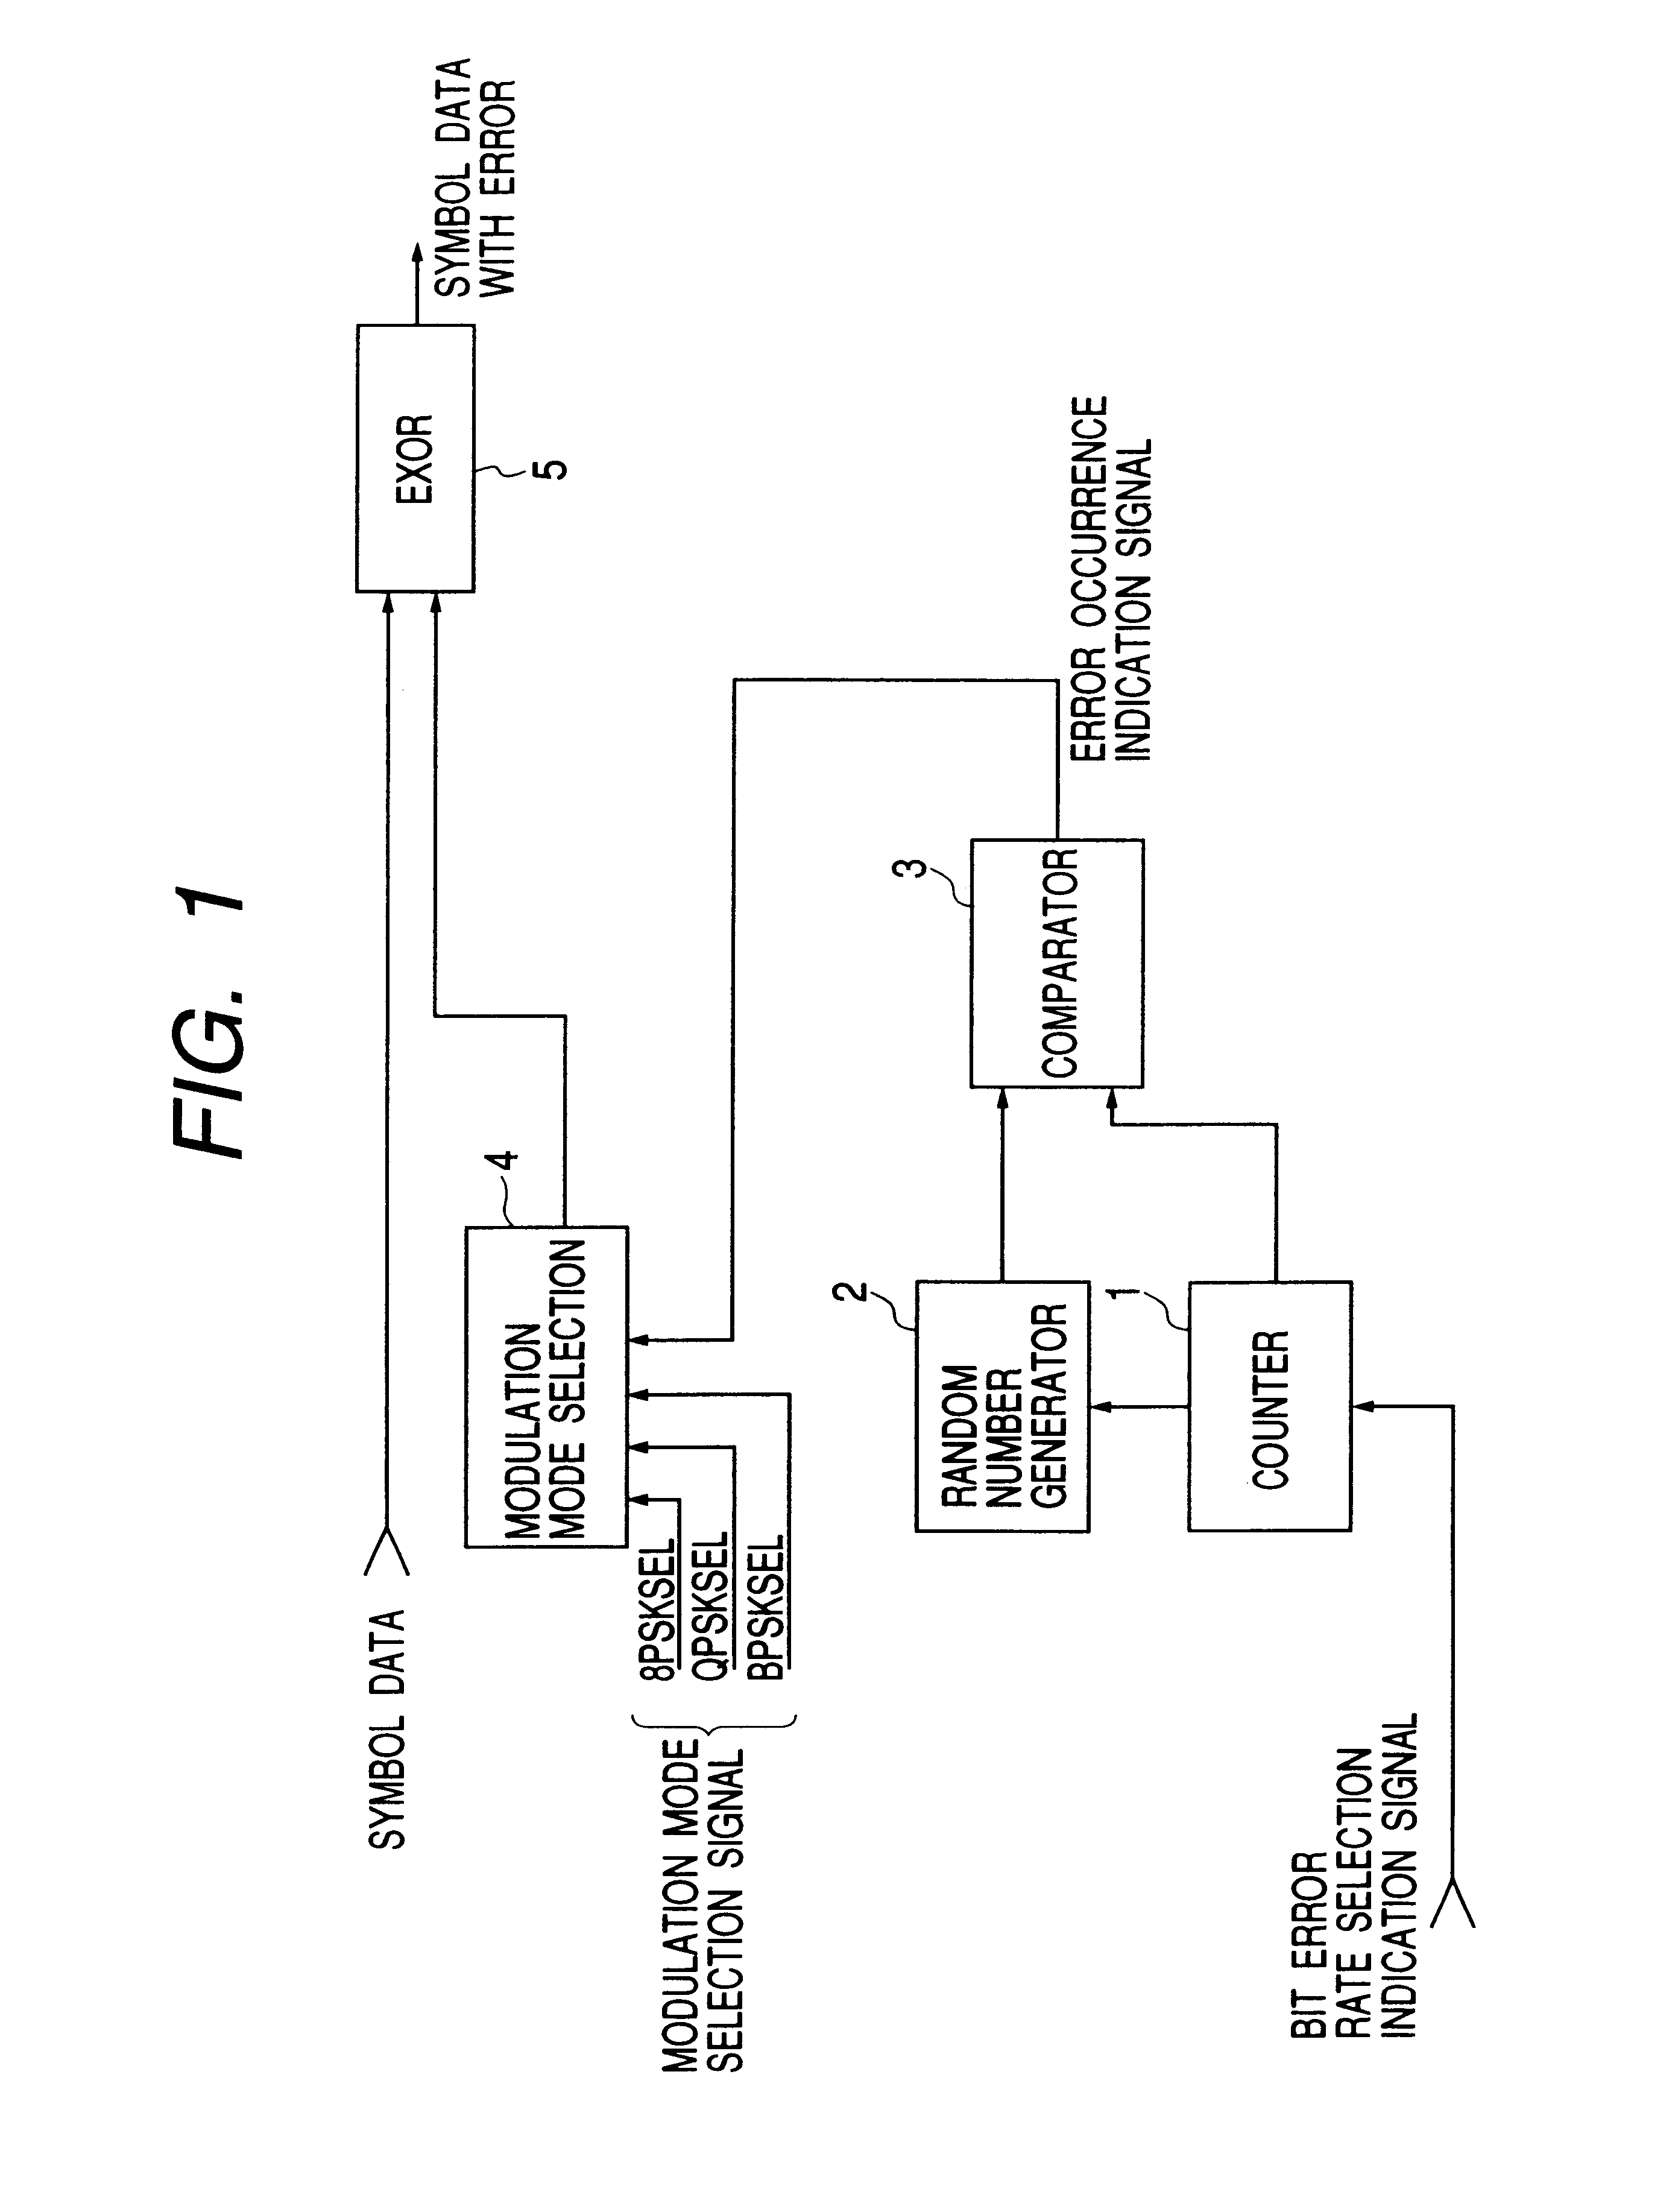 Patent us6772378 dummy error addition circuit google patents patent drawing buycottarizona Image collections